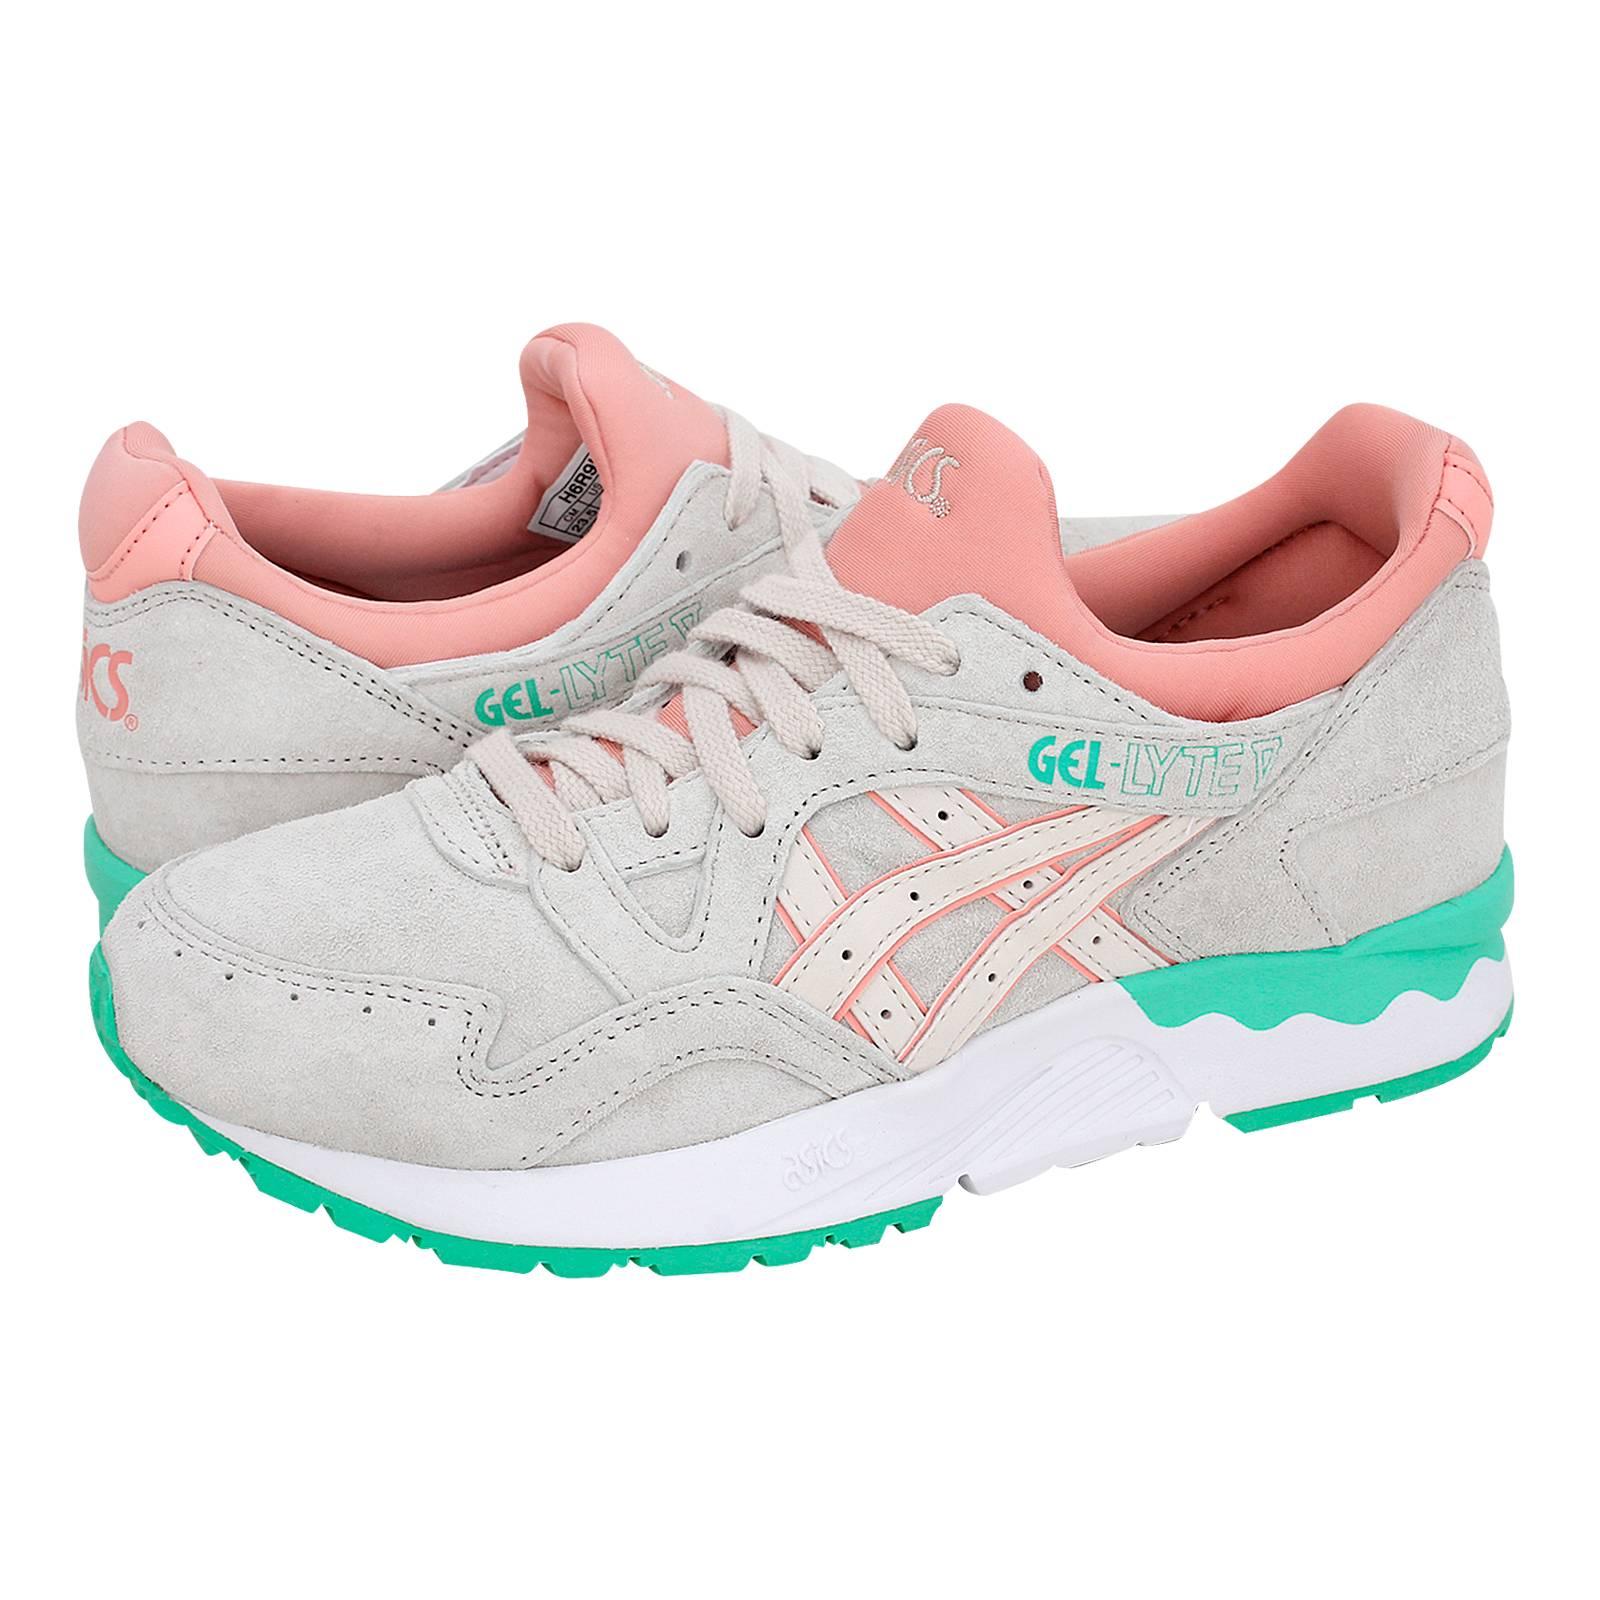 Gel-Lyte V - Γυναικεία αθλητικά παπούτσια Asics από καστορι και ... 7fa08a58ca4